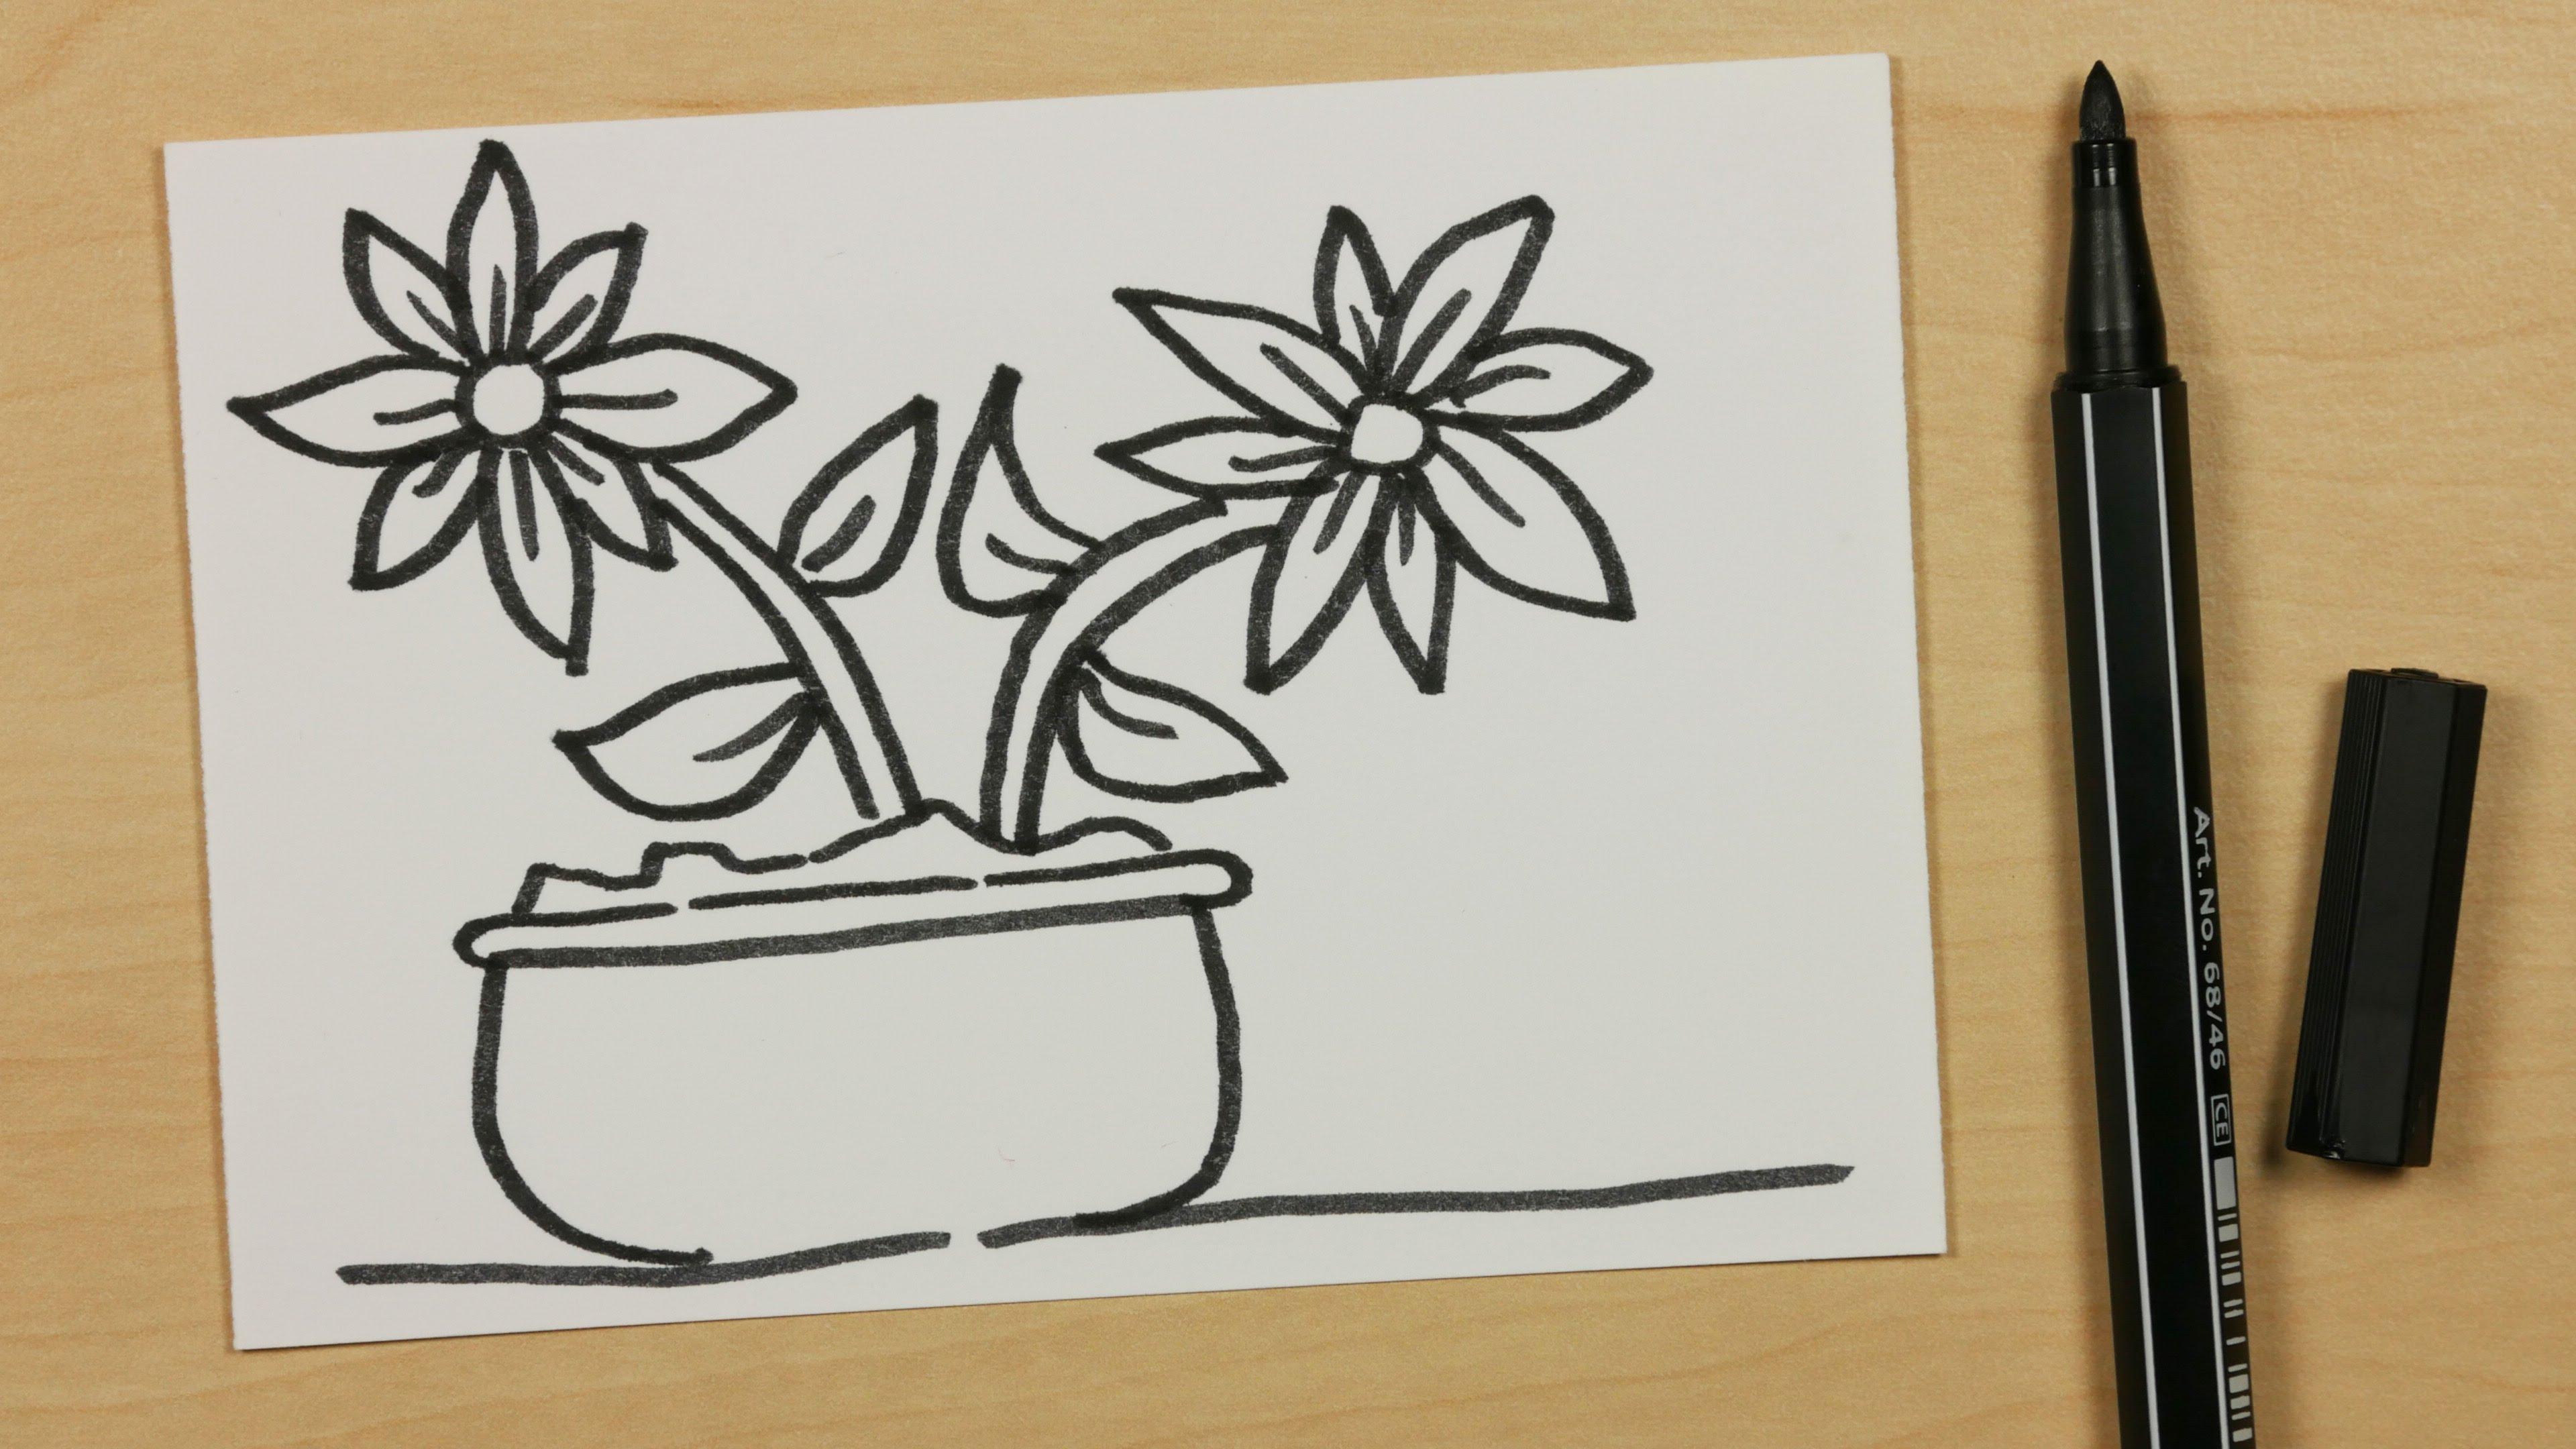 Drawn pot plant sketch Cartoon Cartoon with Kids Pot